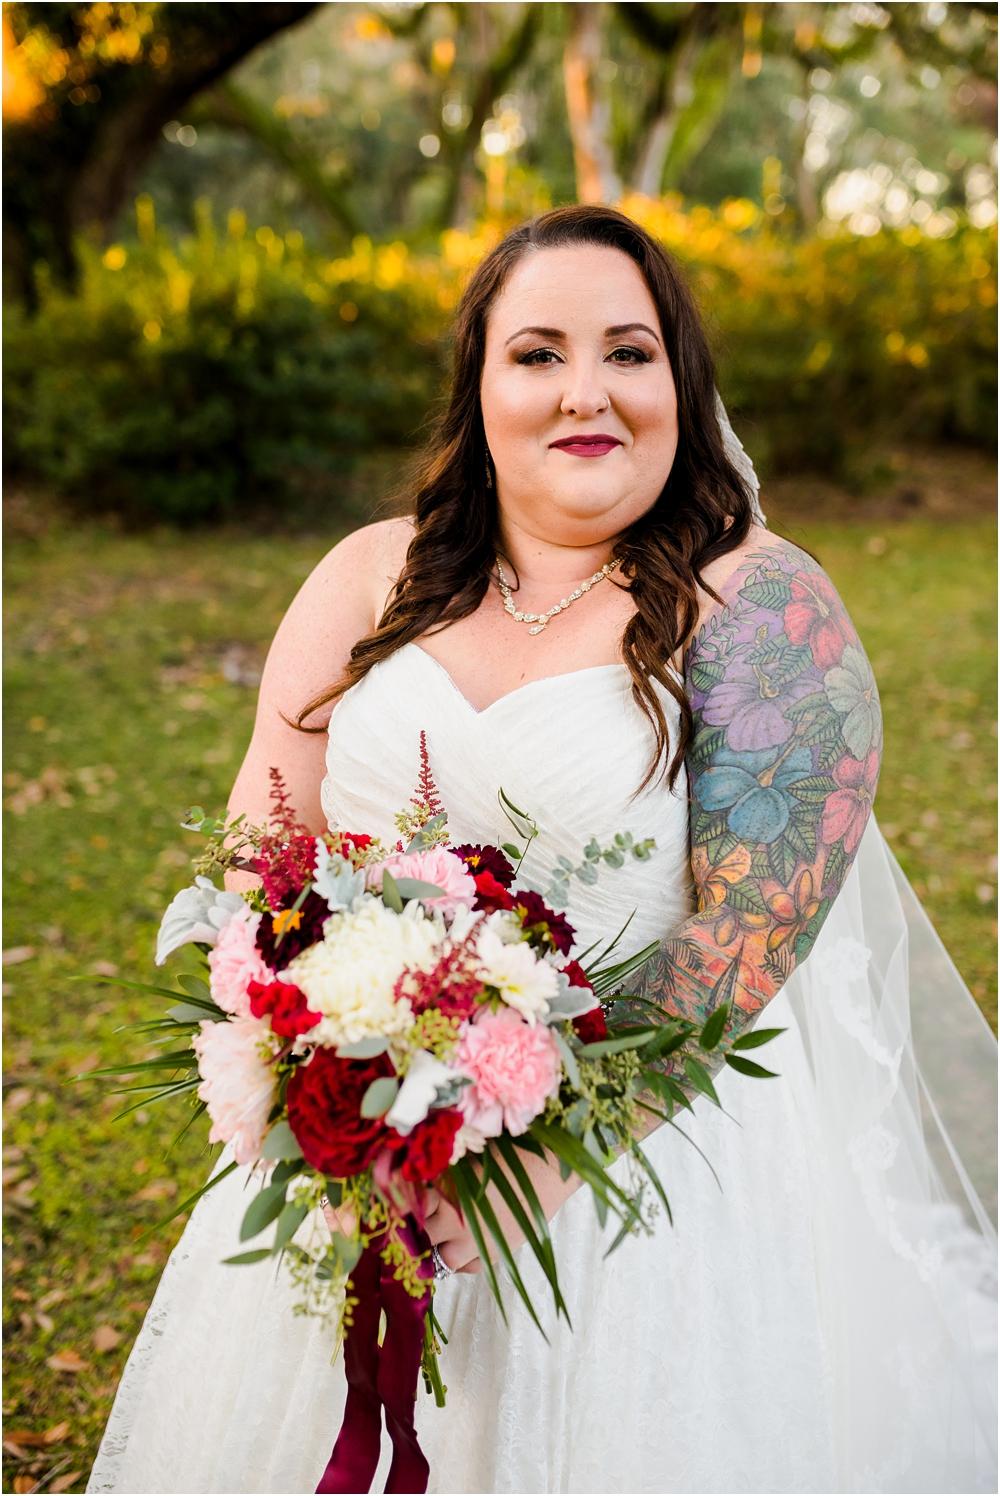 Eden-Gardens-florida-wedding-photographer-kiersten-stevenson-photography-100.jpg